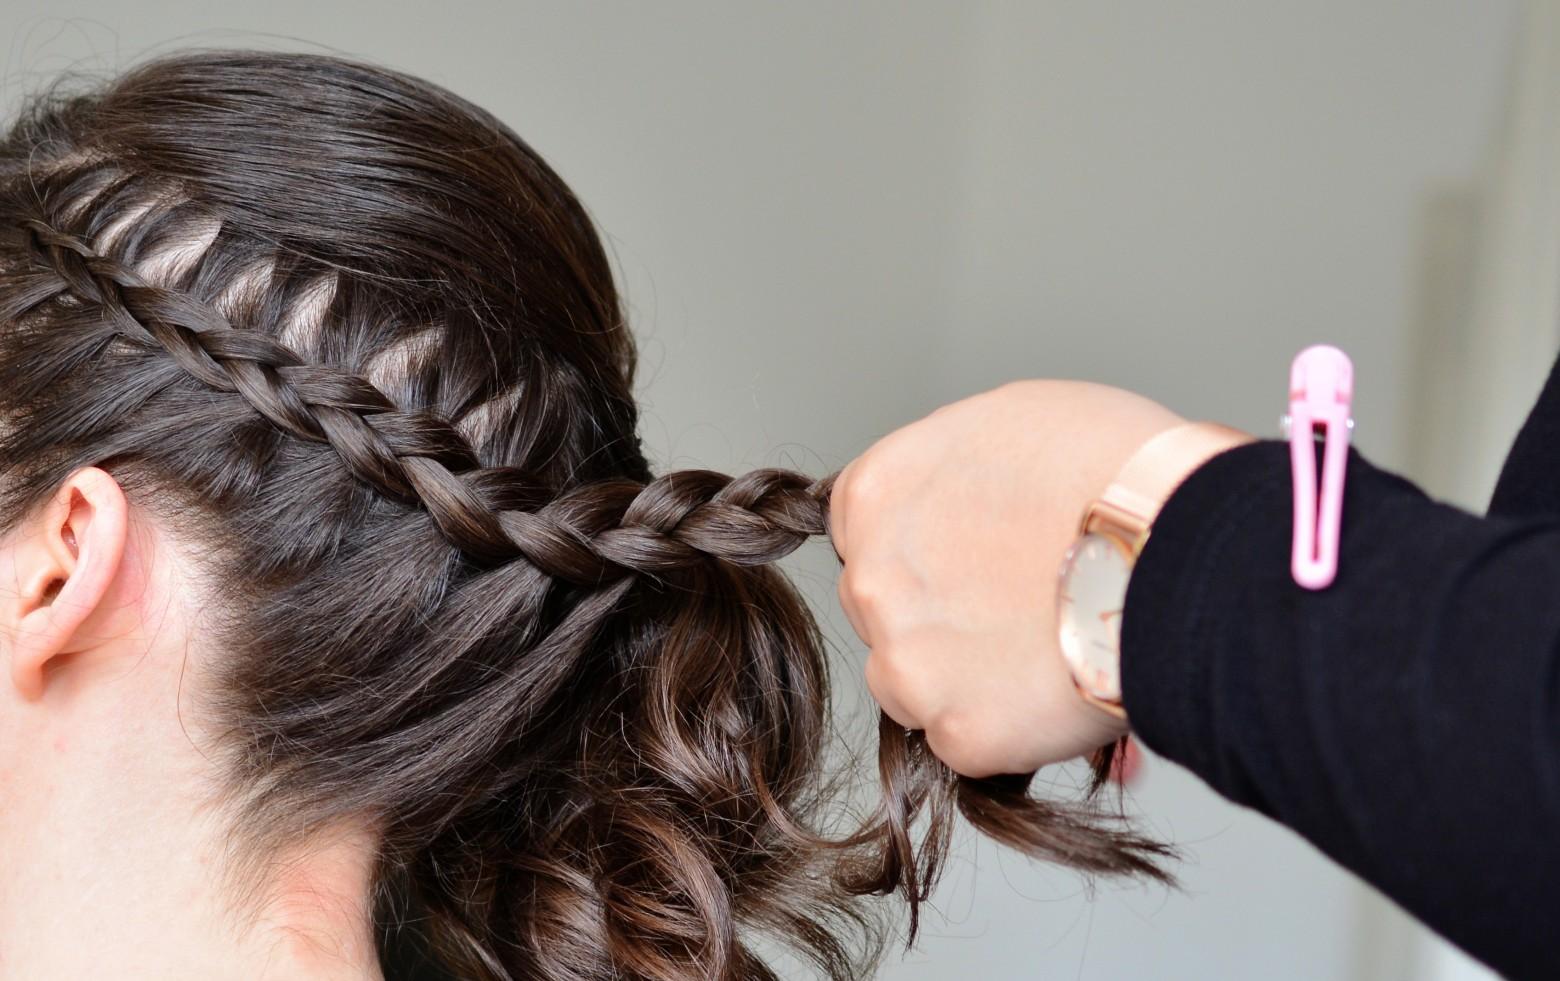 Idee coiffure tresse tendance pour mariage, mariée, ceremonie